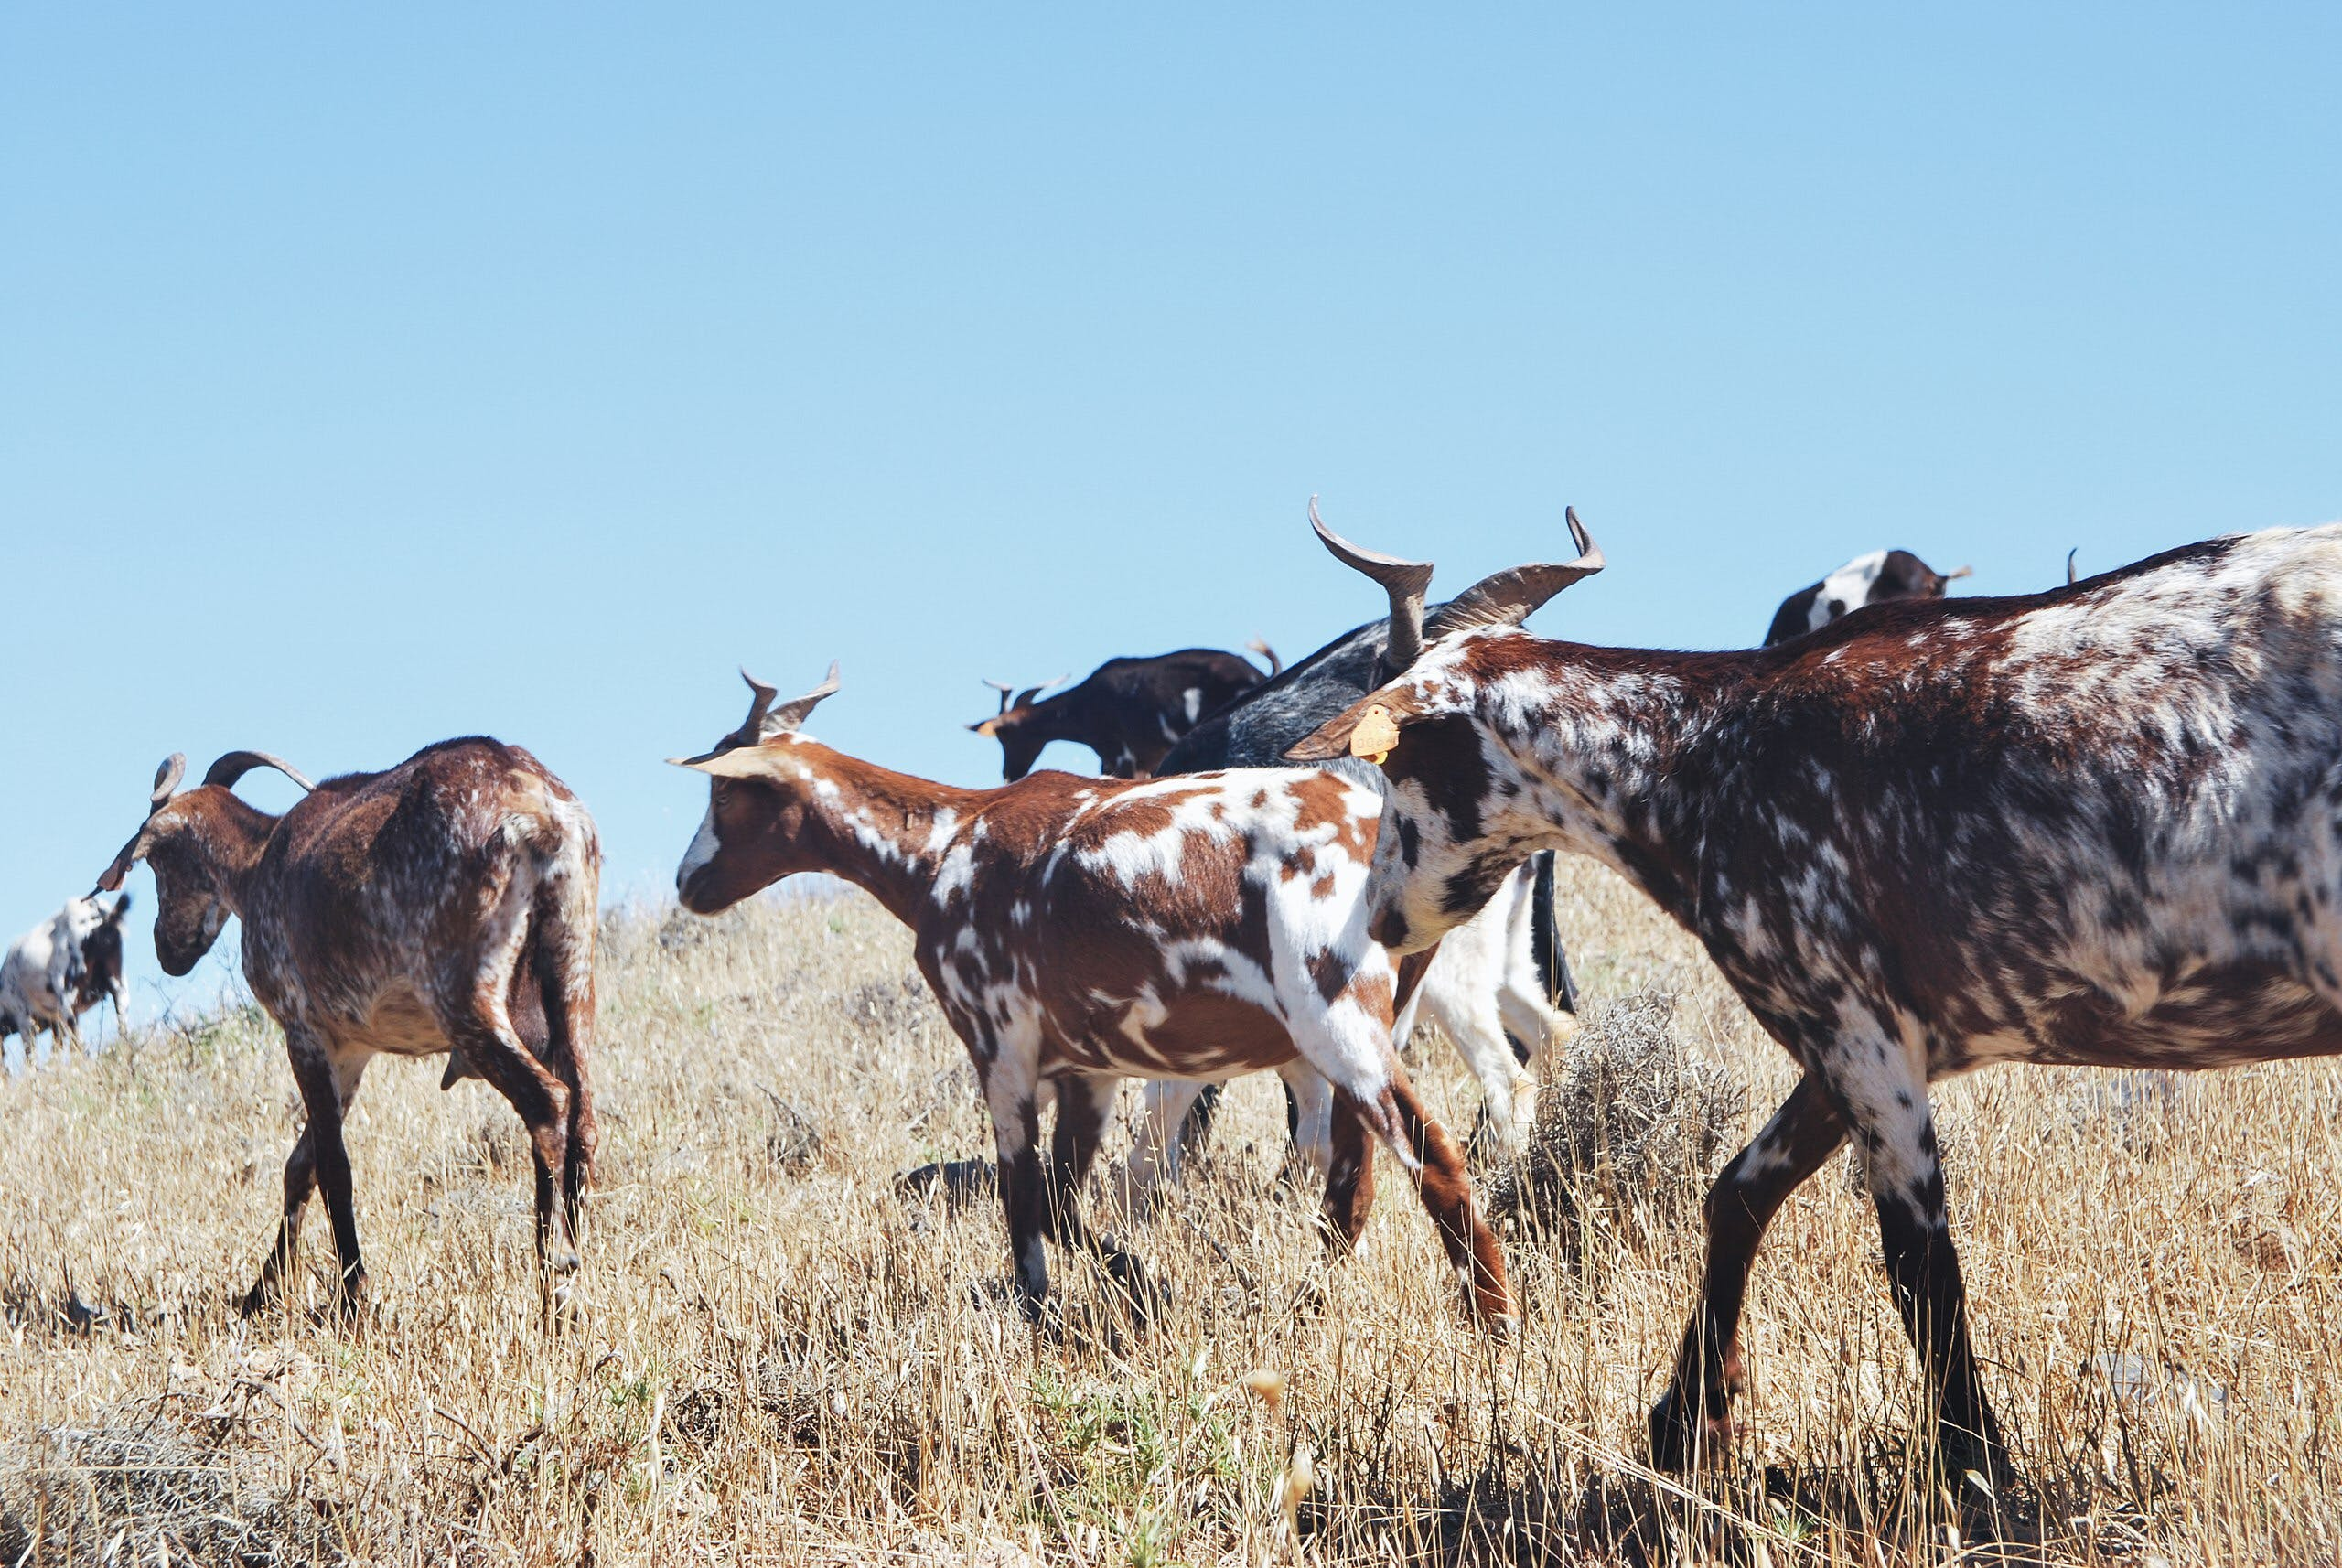 Herd of Goat on Grass Field